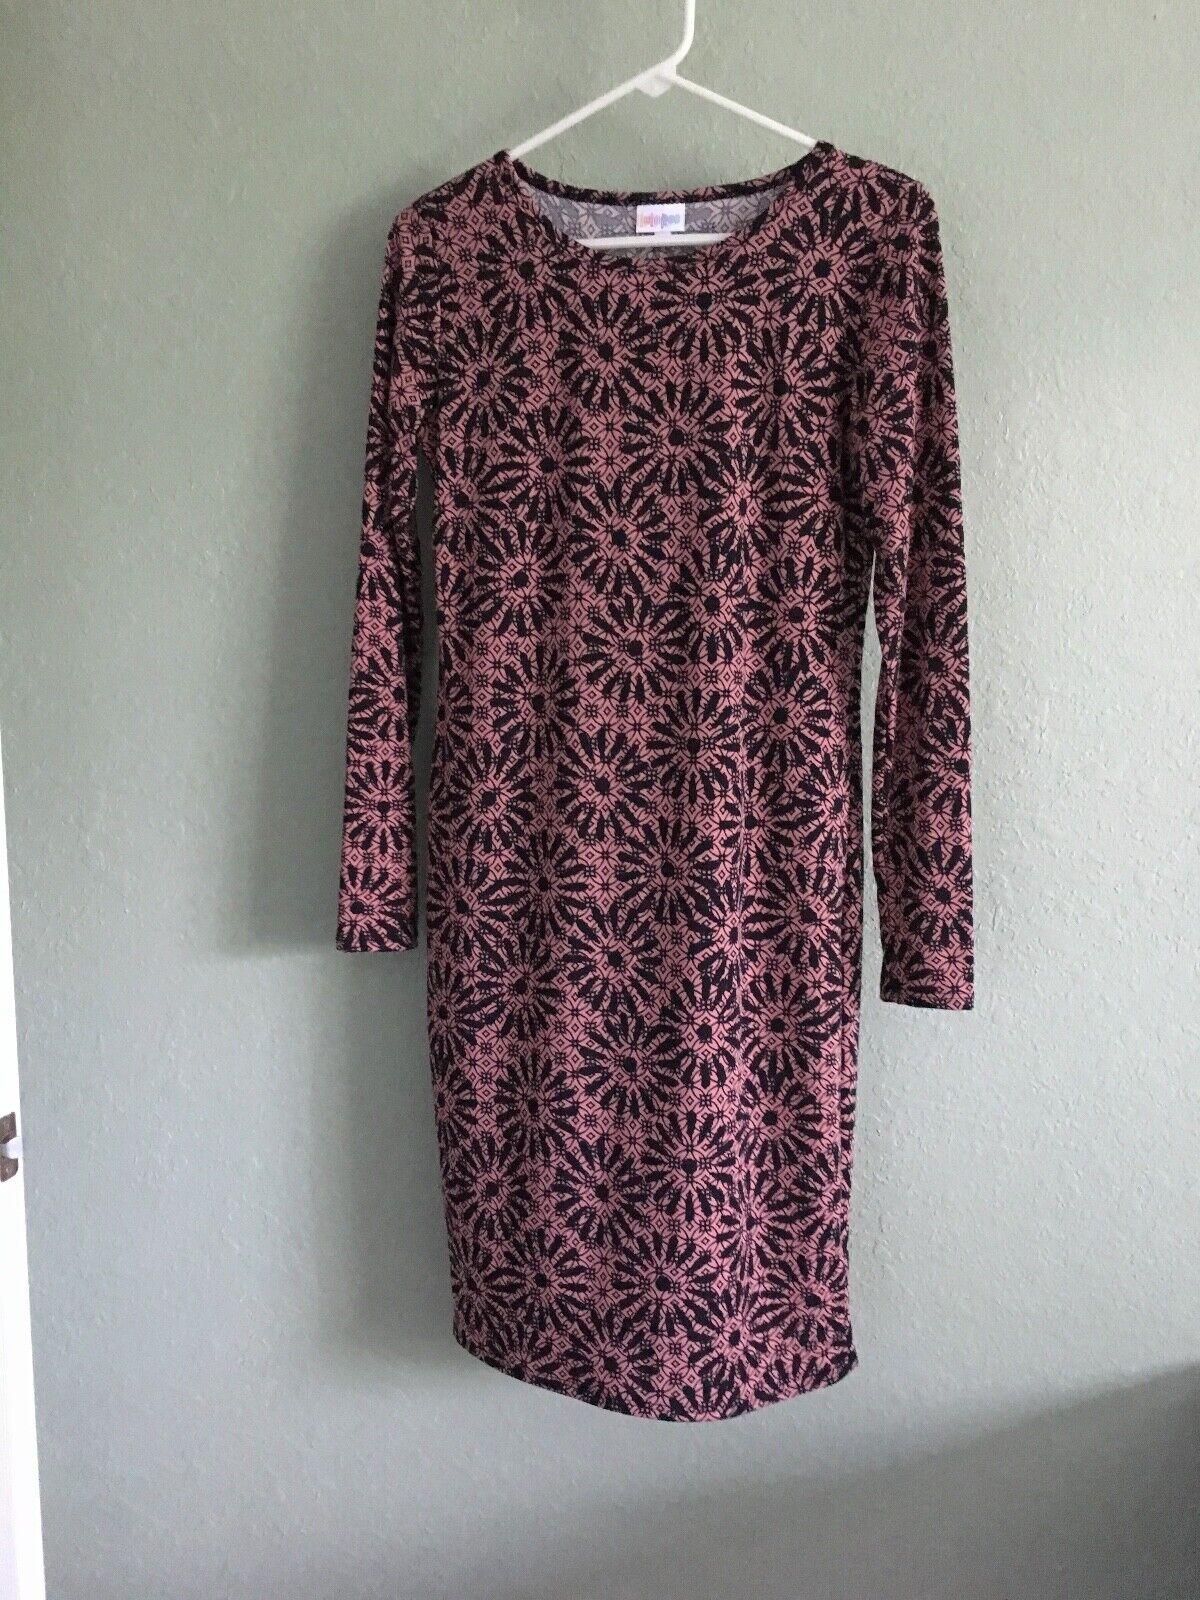 NEW Women's  Floral Print LULAROE Debbie Bodycon Soft Knit Dress Size S